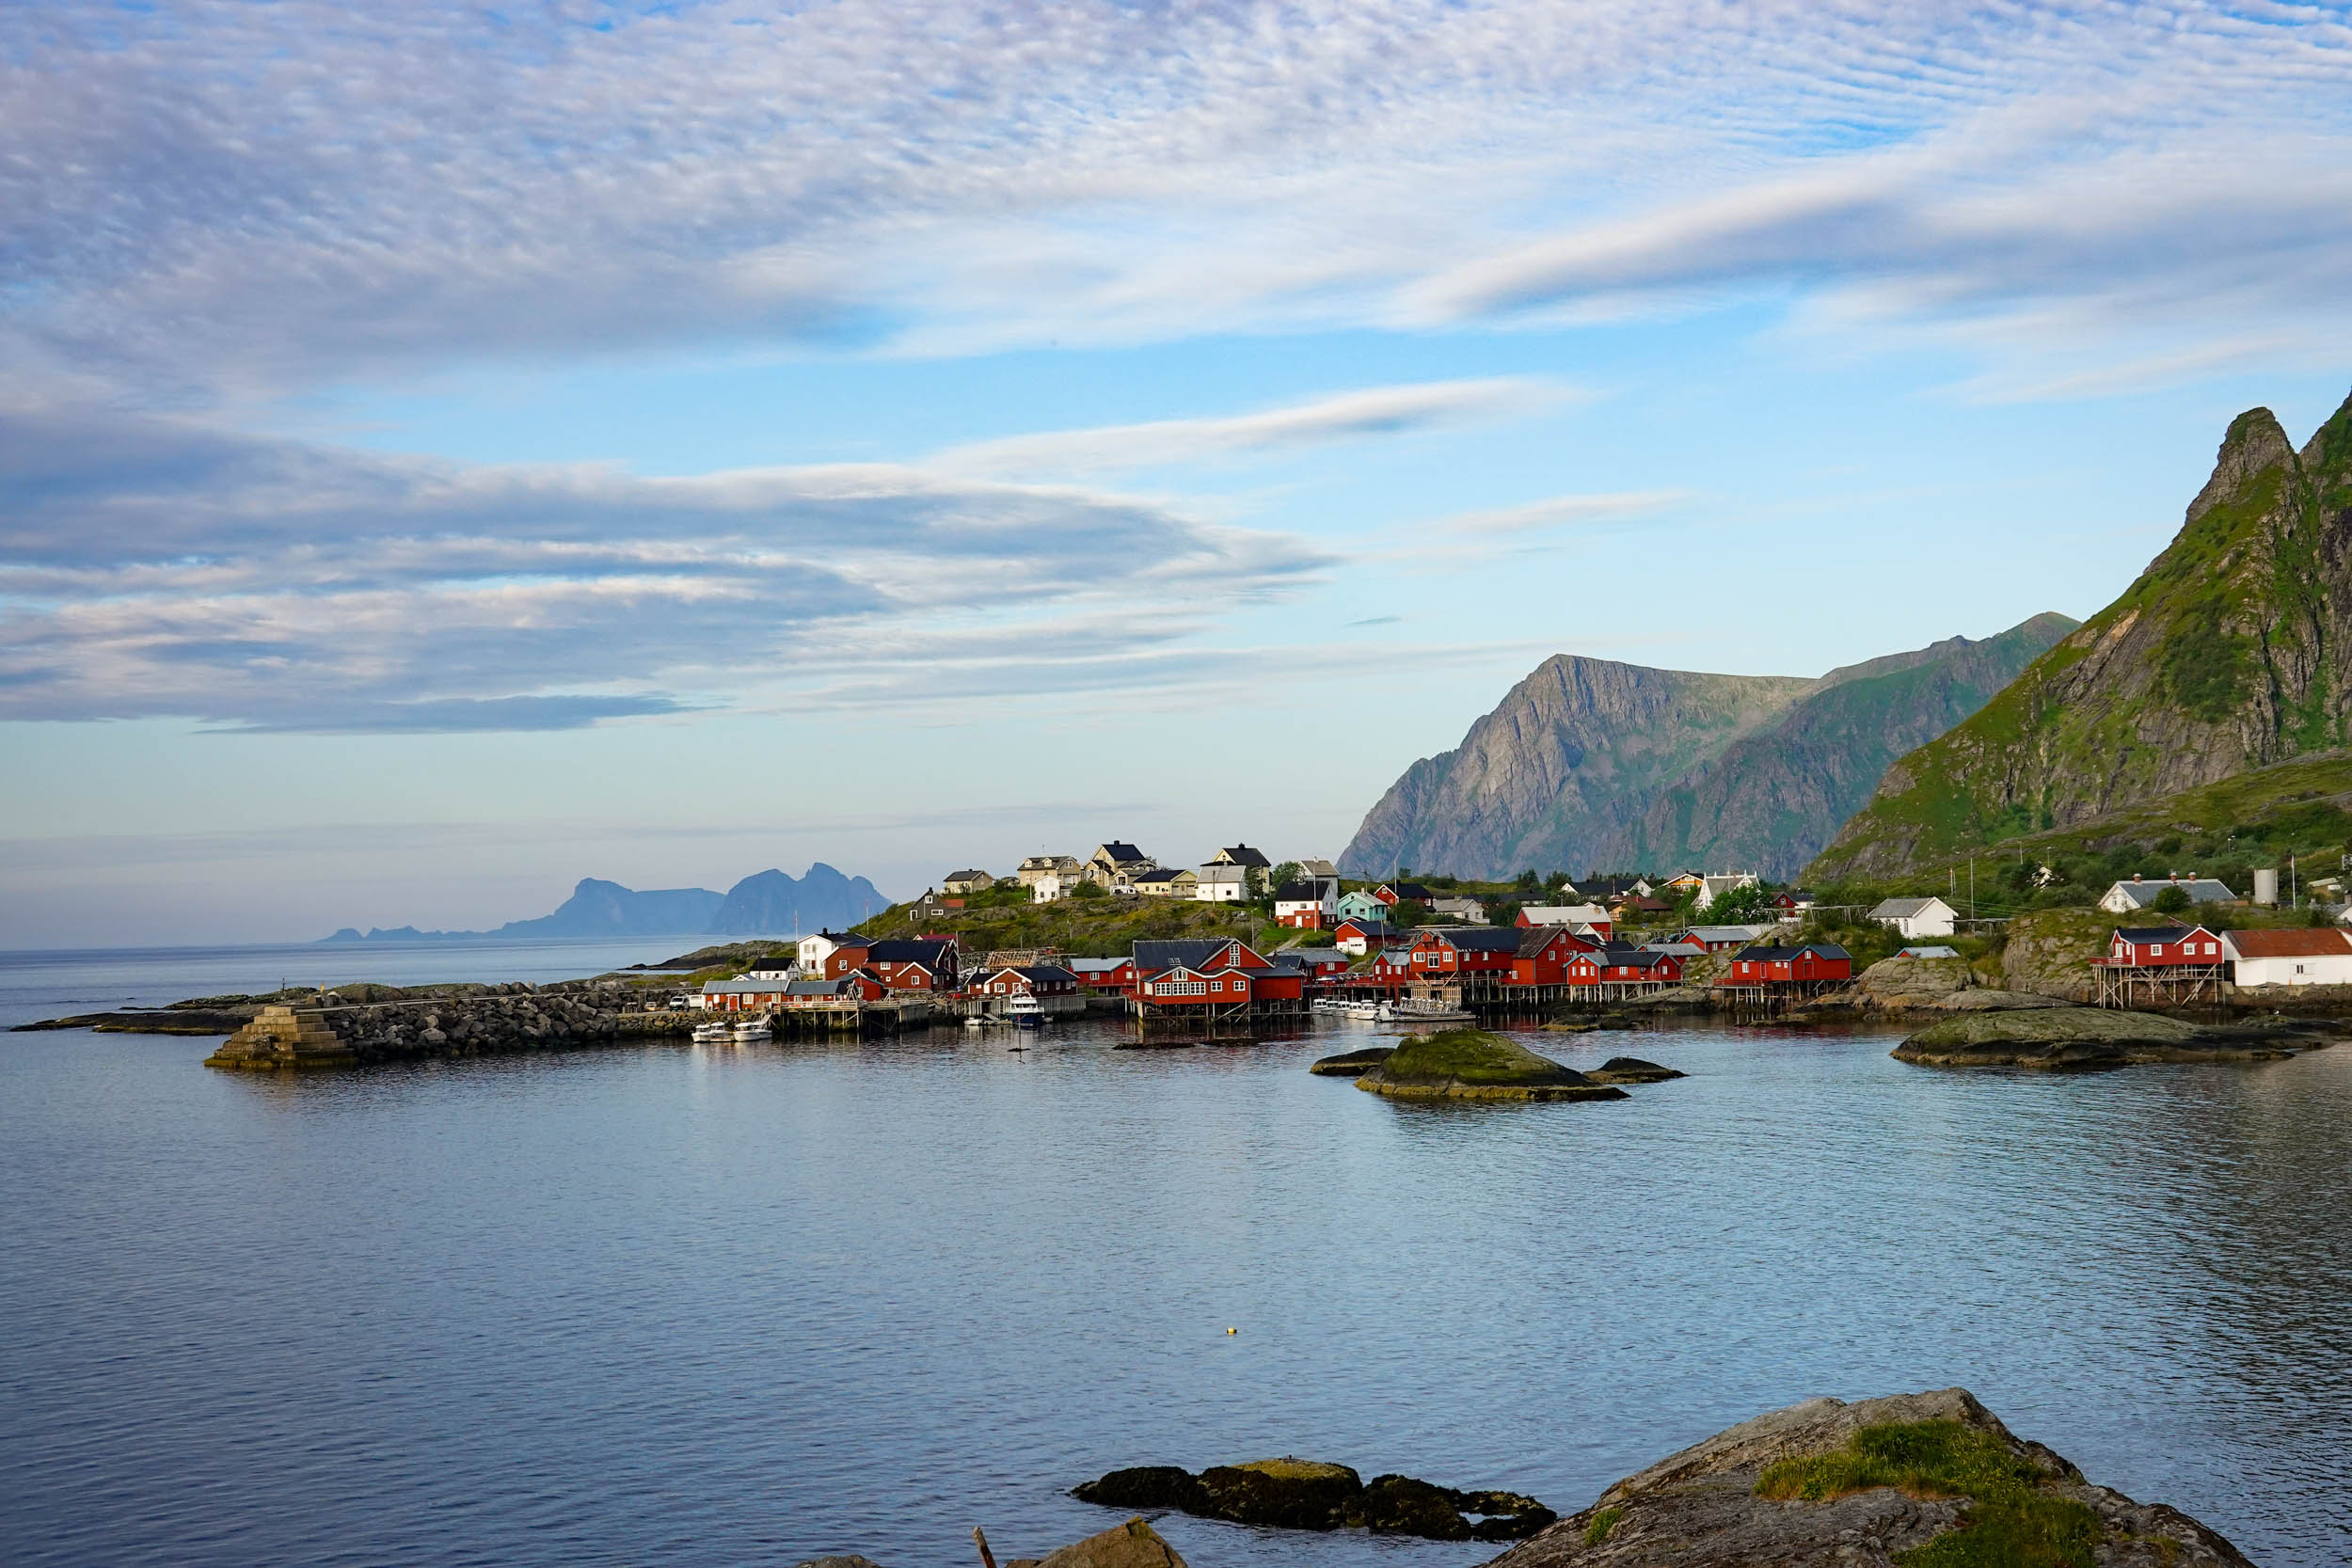 00130000 00981 Norwegen Nordland Sørvågen.jpg